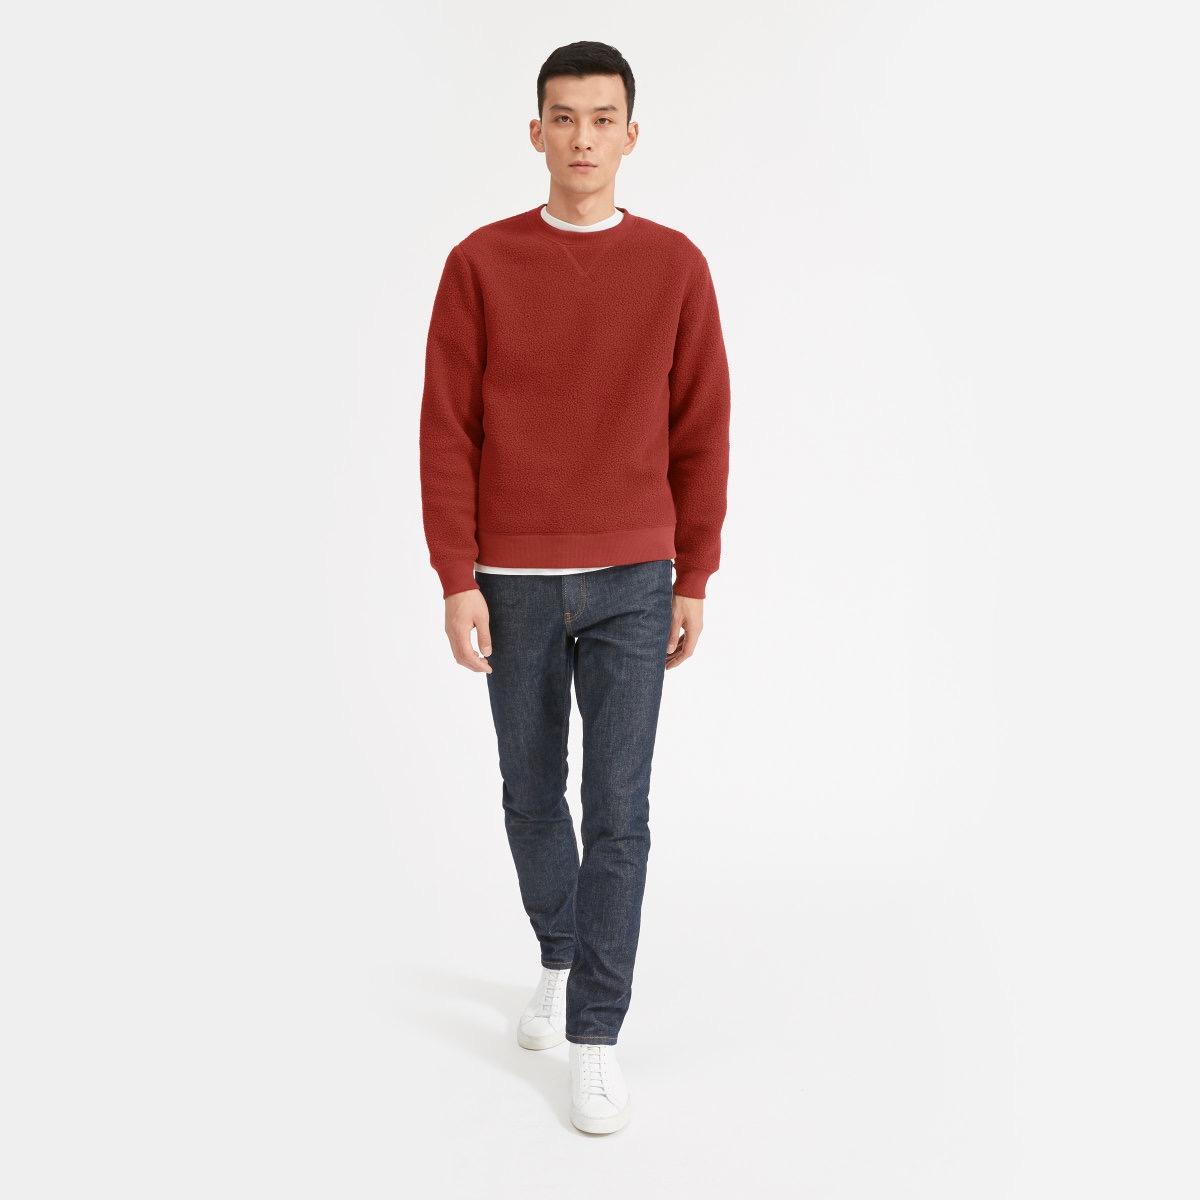 man in red Everlane fleece sweater